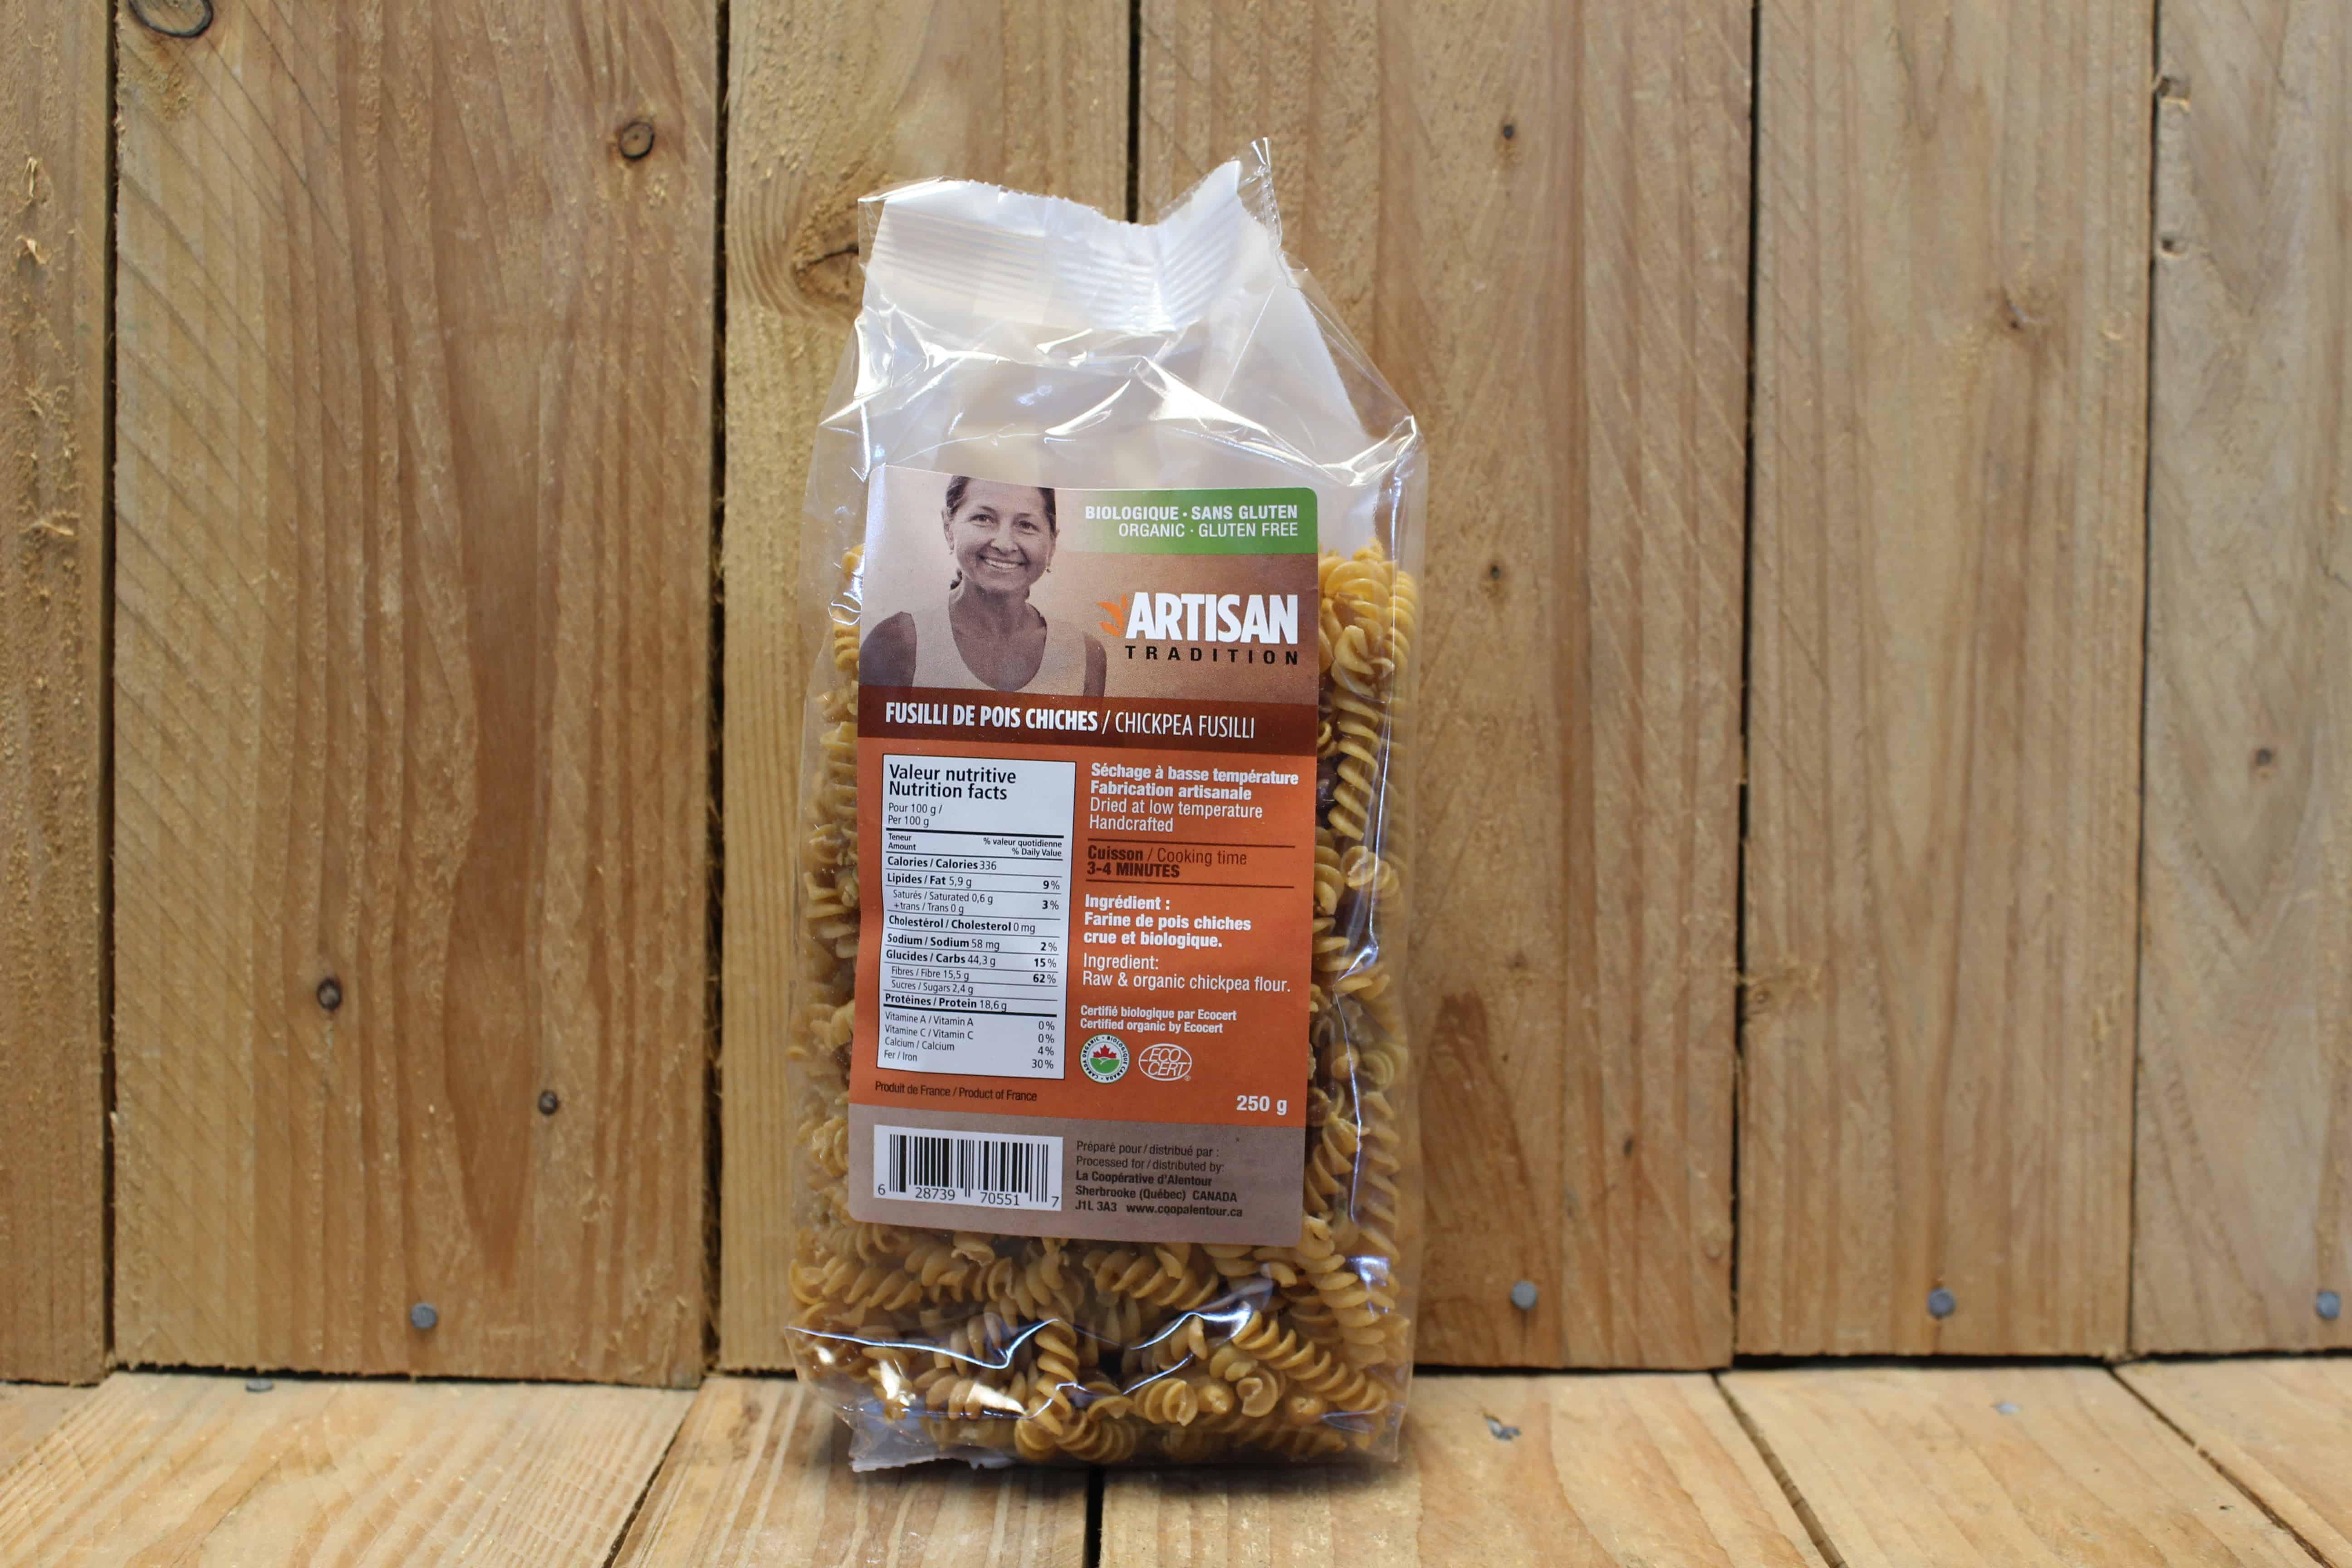 Artisan Tradition – Organic Pasta – Chickpea Fusilli (250g)